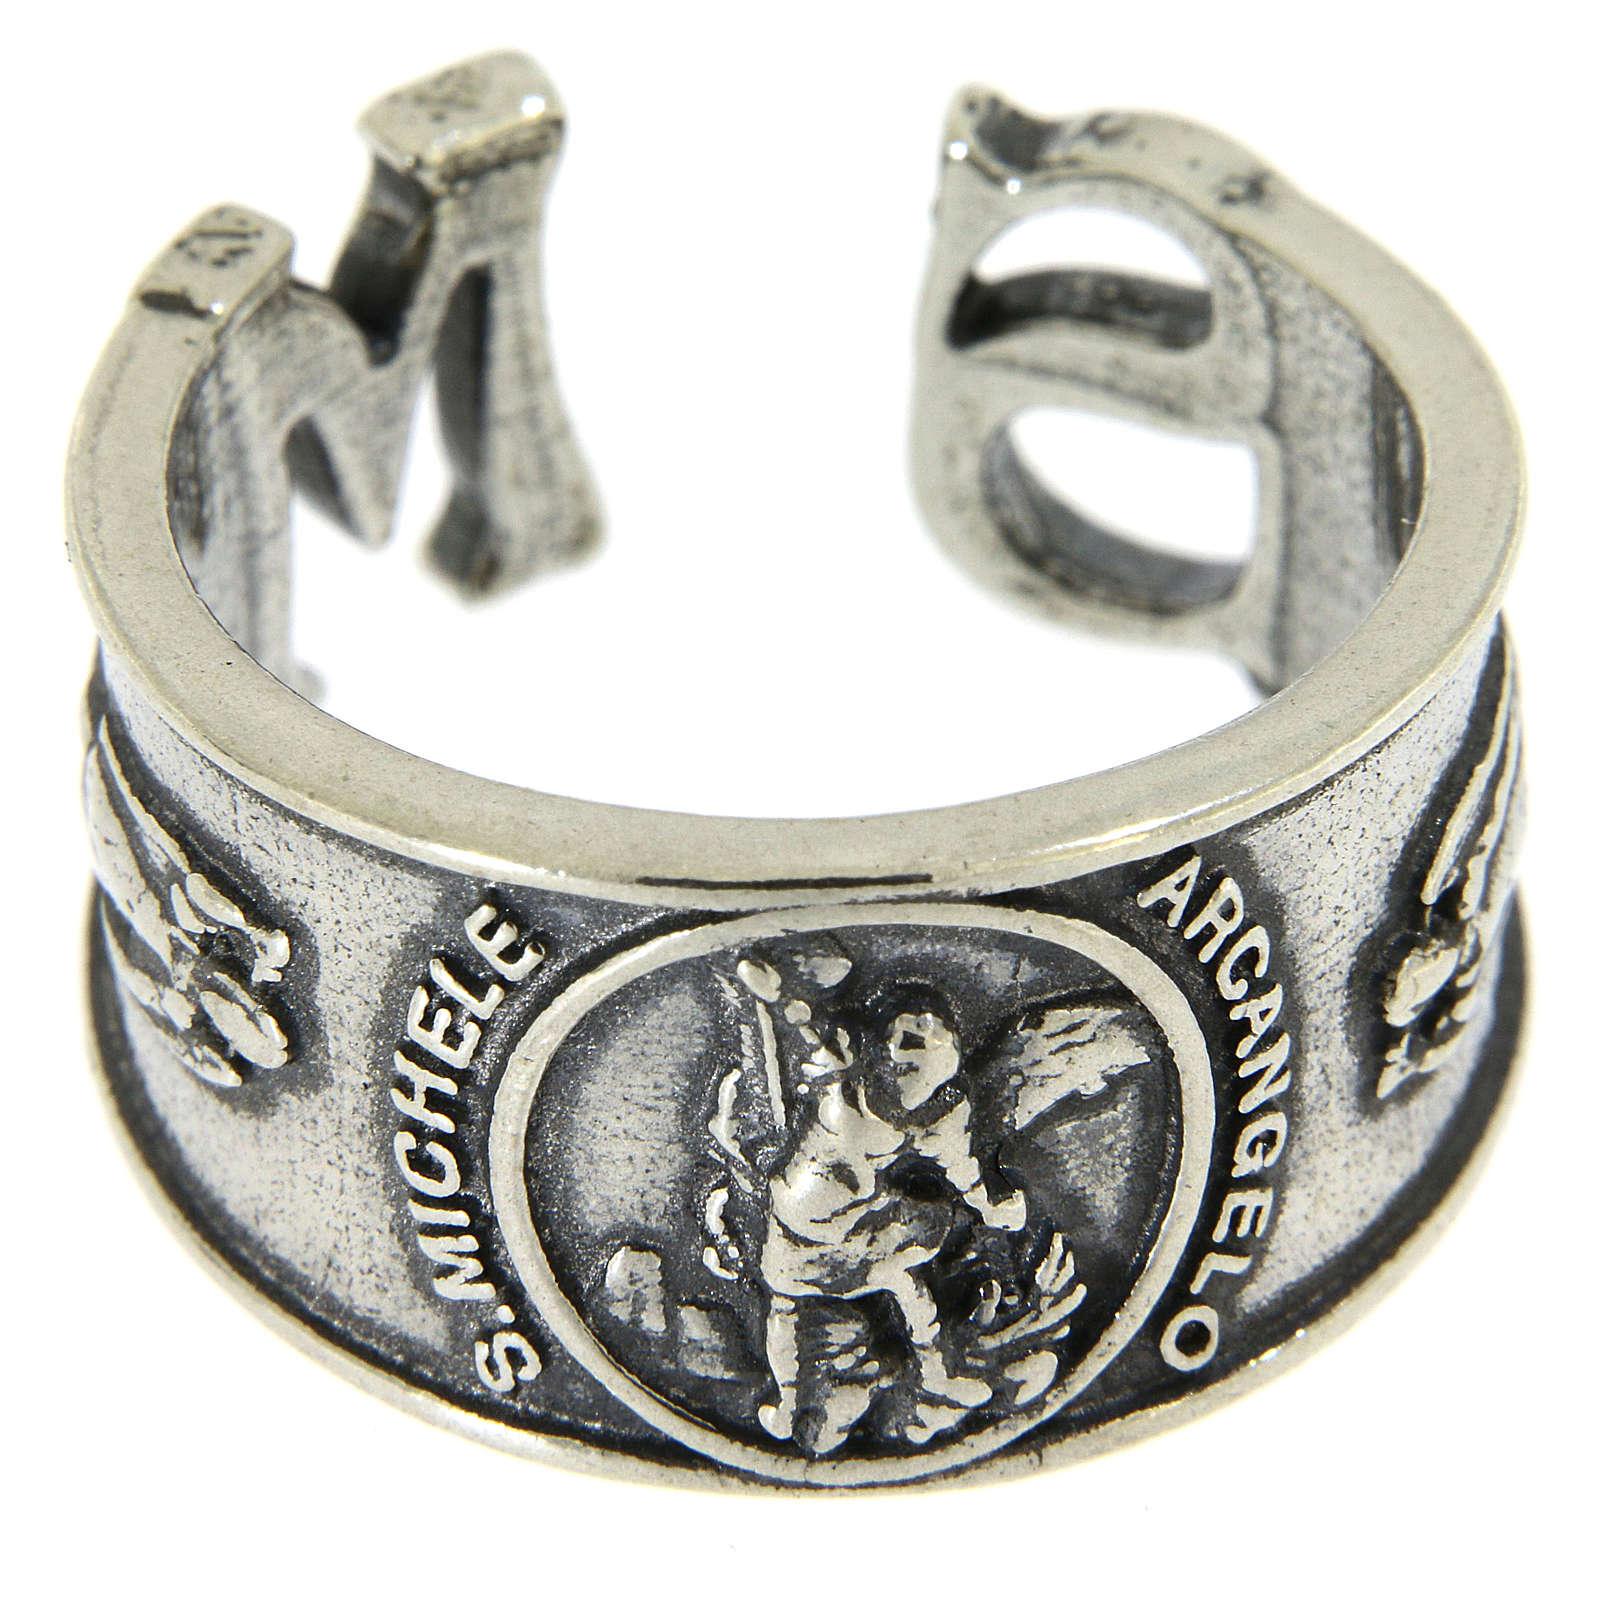 Anel São Miguel Arcanjo prata 925 3